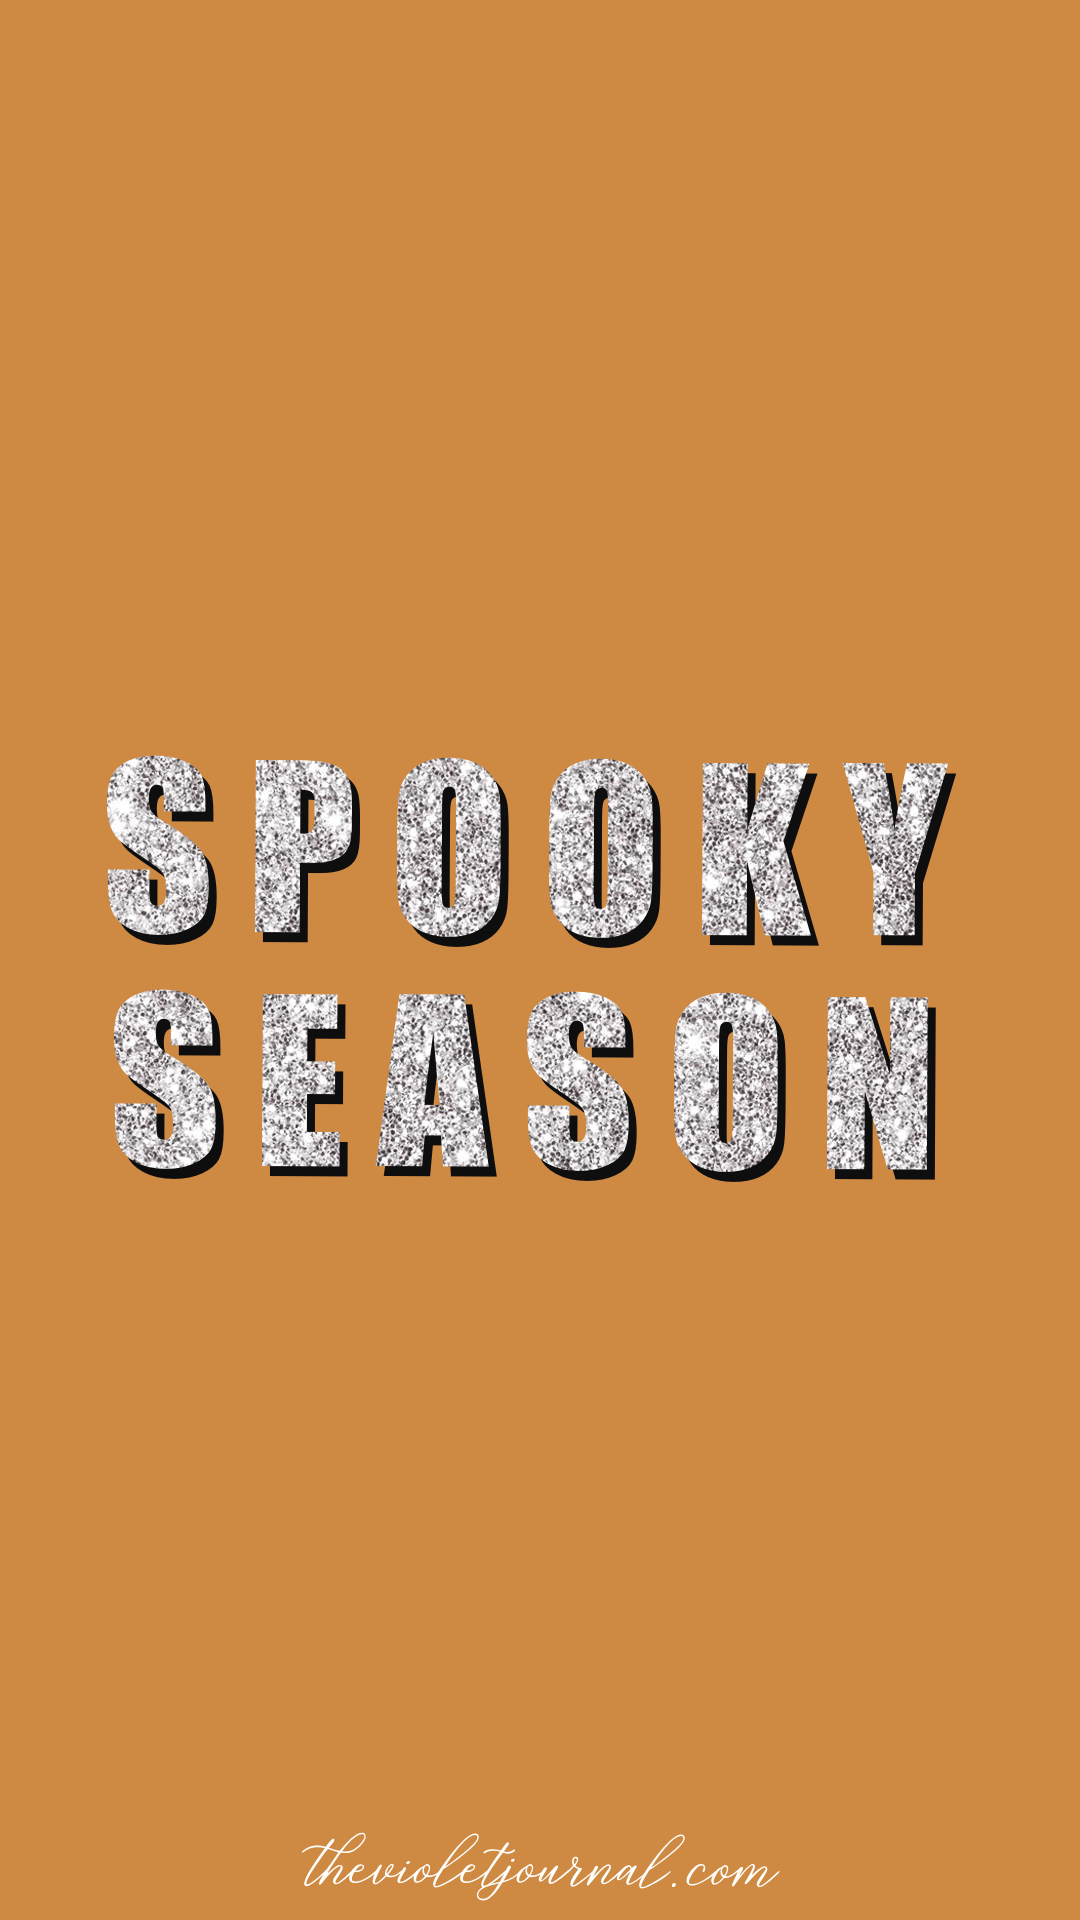 orange spooky season iphone wallpaper